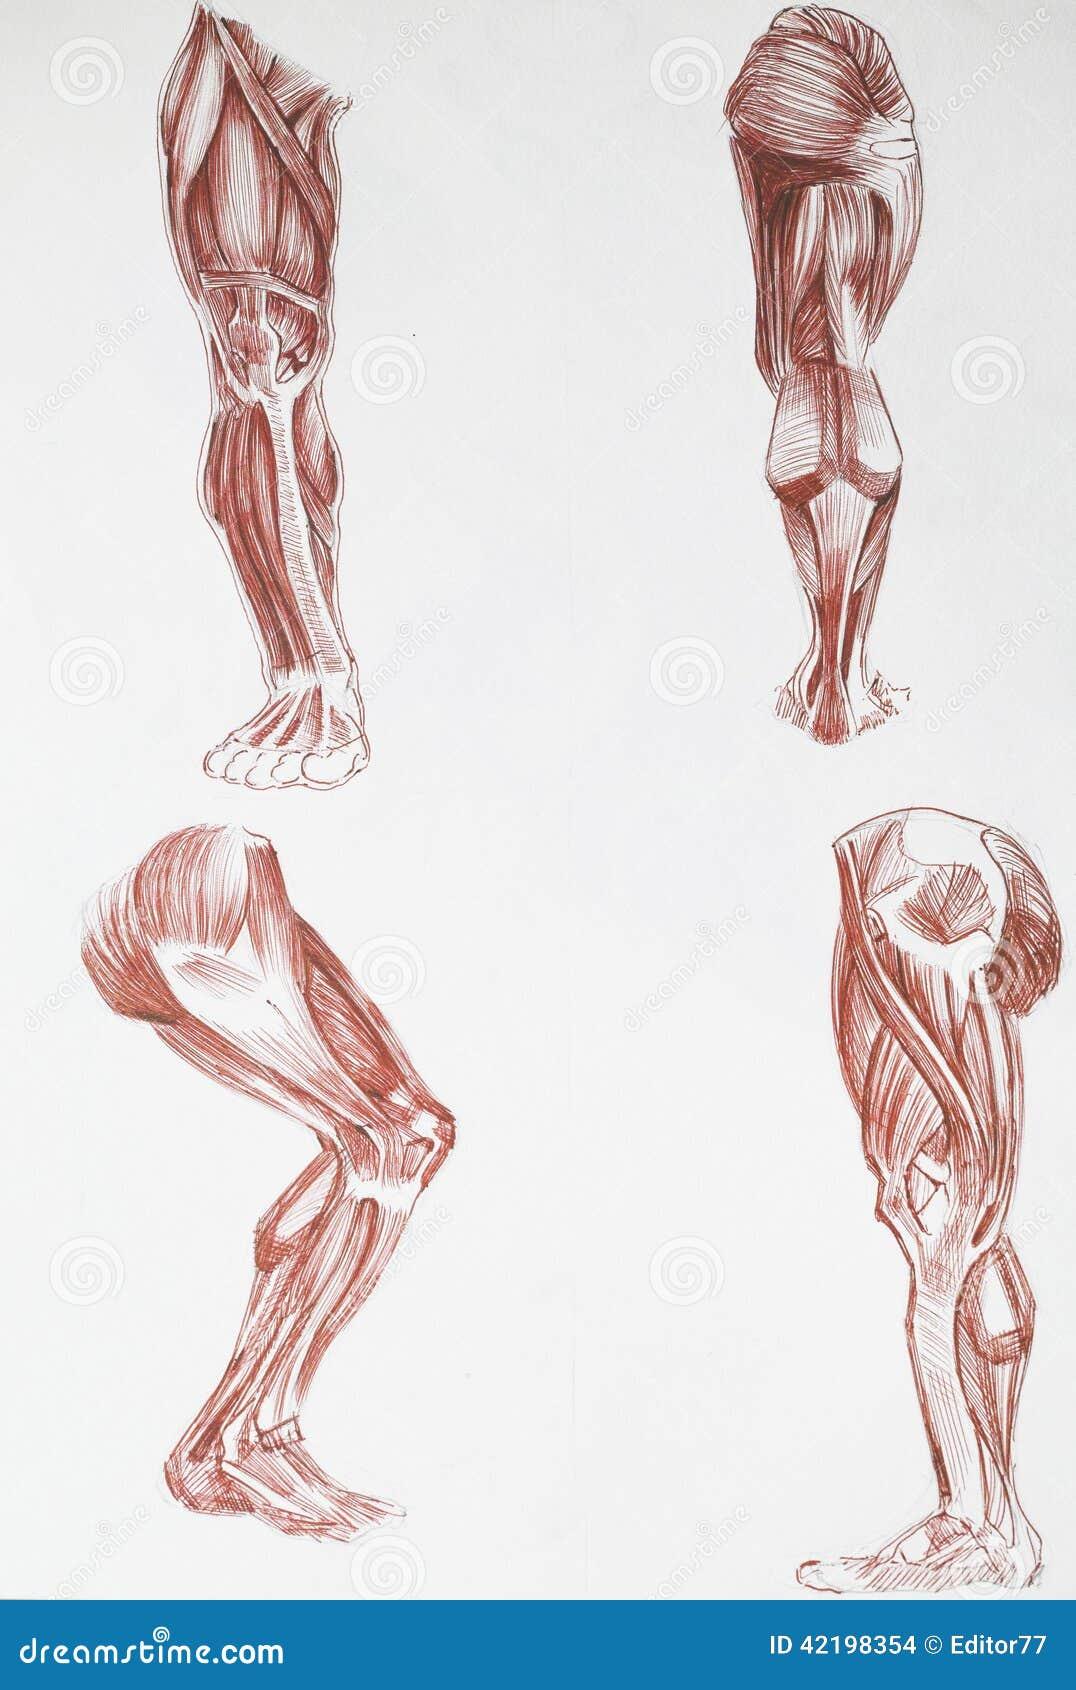 Human Body Parts Stock Illustration Illustration Of Human 42198354